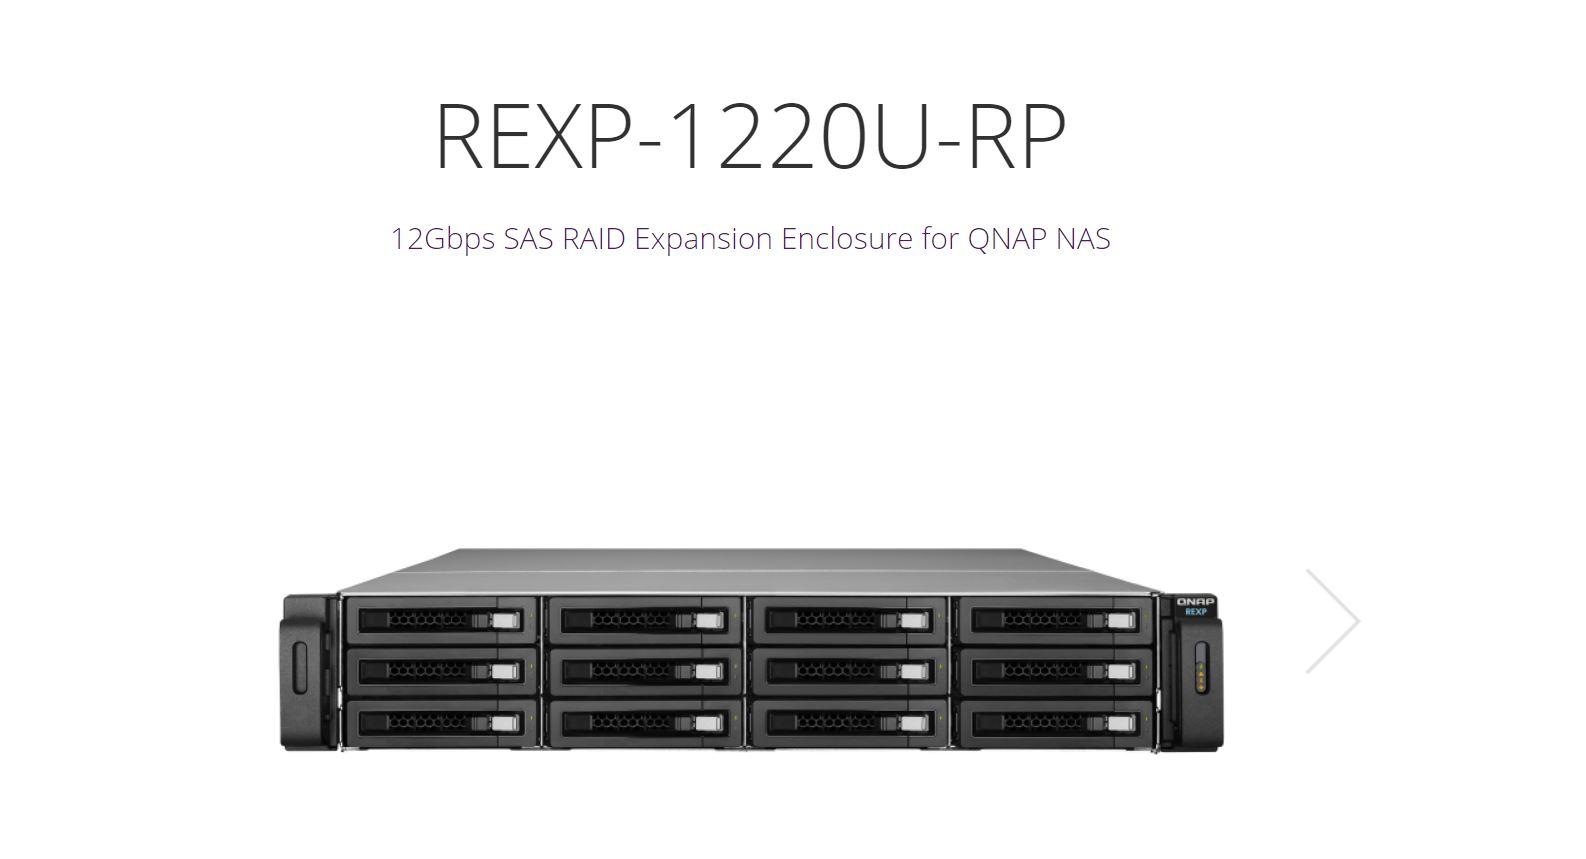 QNAP REXP-1220U-RP 12-Bay SAS 12G Expension Unit for Enterprise Models, Without Rail Kit. 3 yr AR wty (NO RAIL)